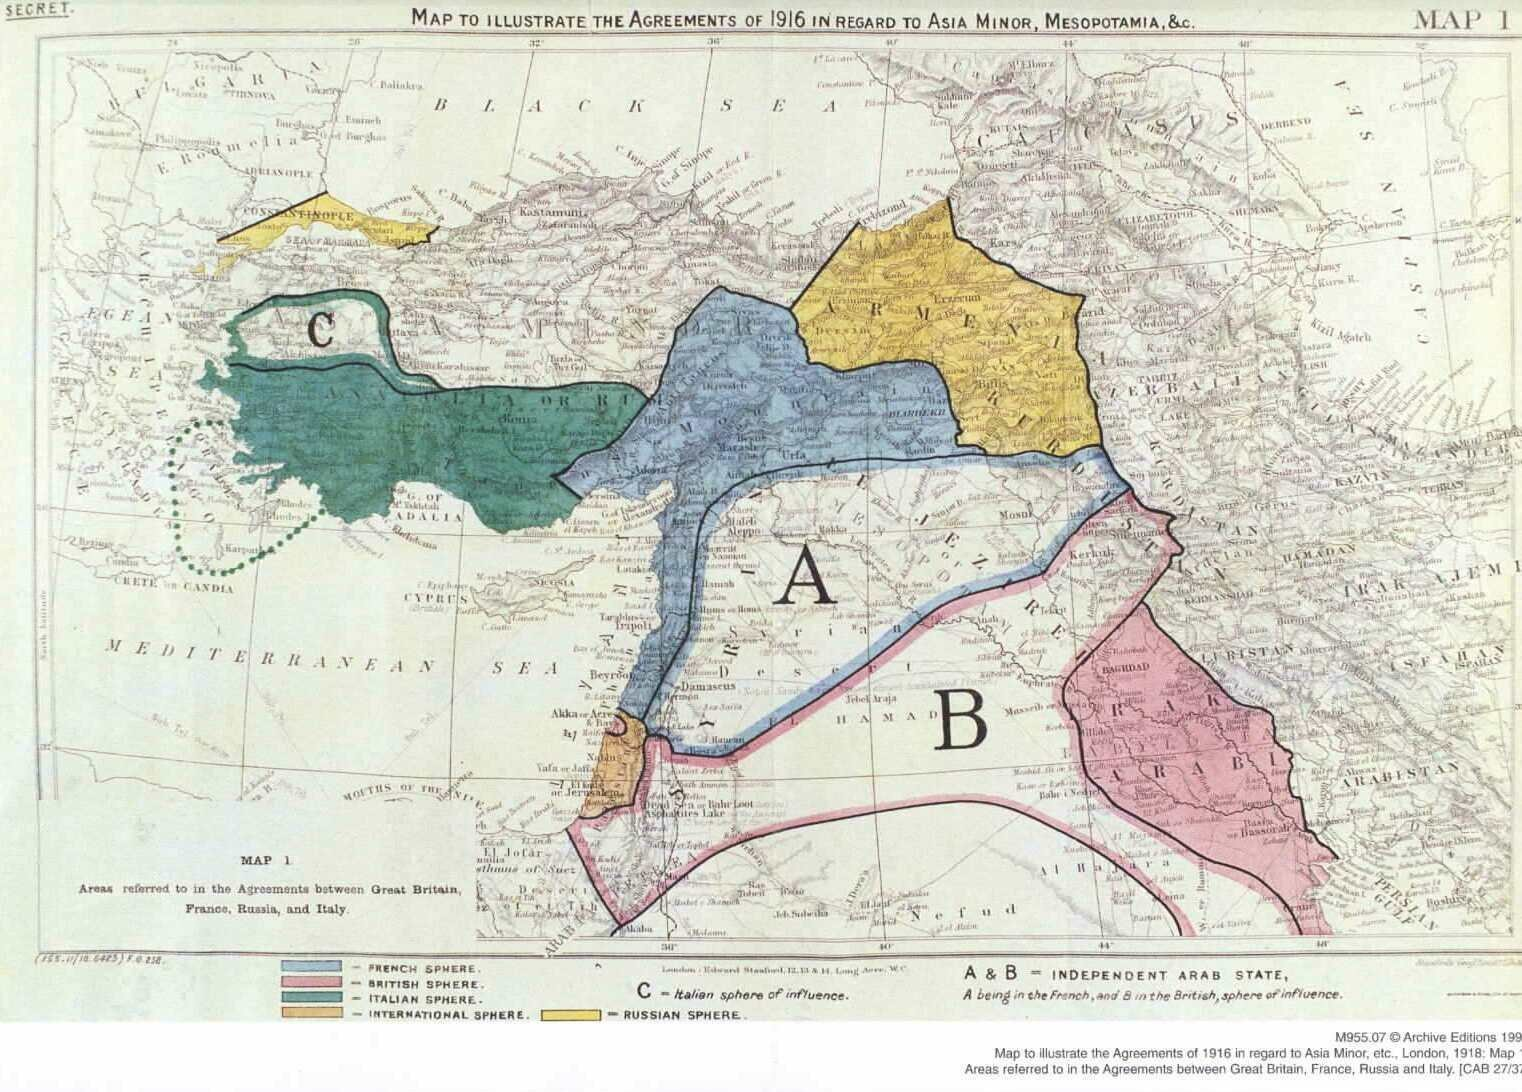 100 Tahun Lalu Sykes-Picot Memulai Malapetaka untuk Timur Tengah